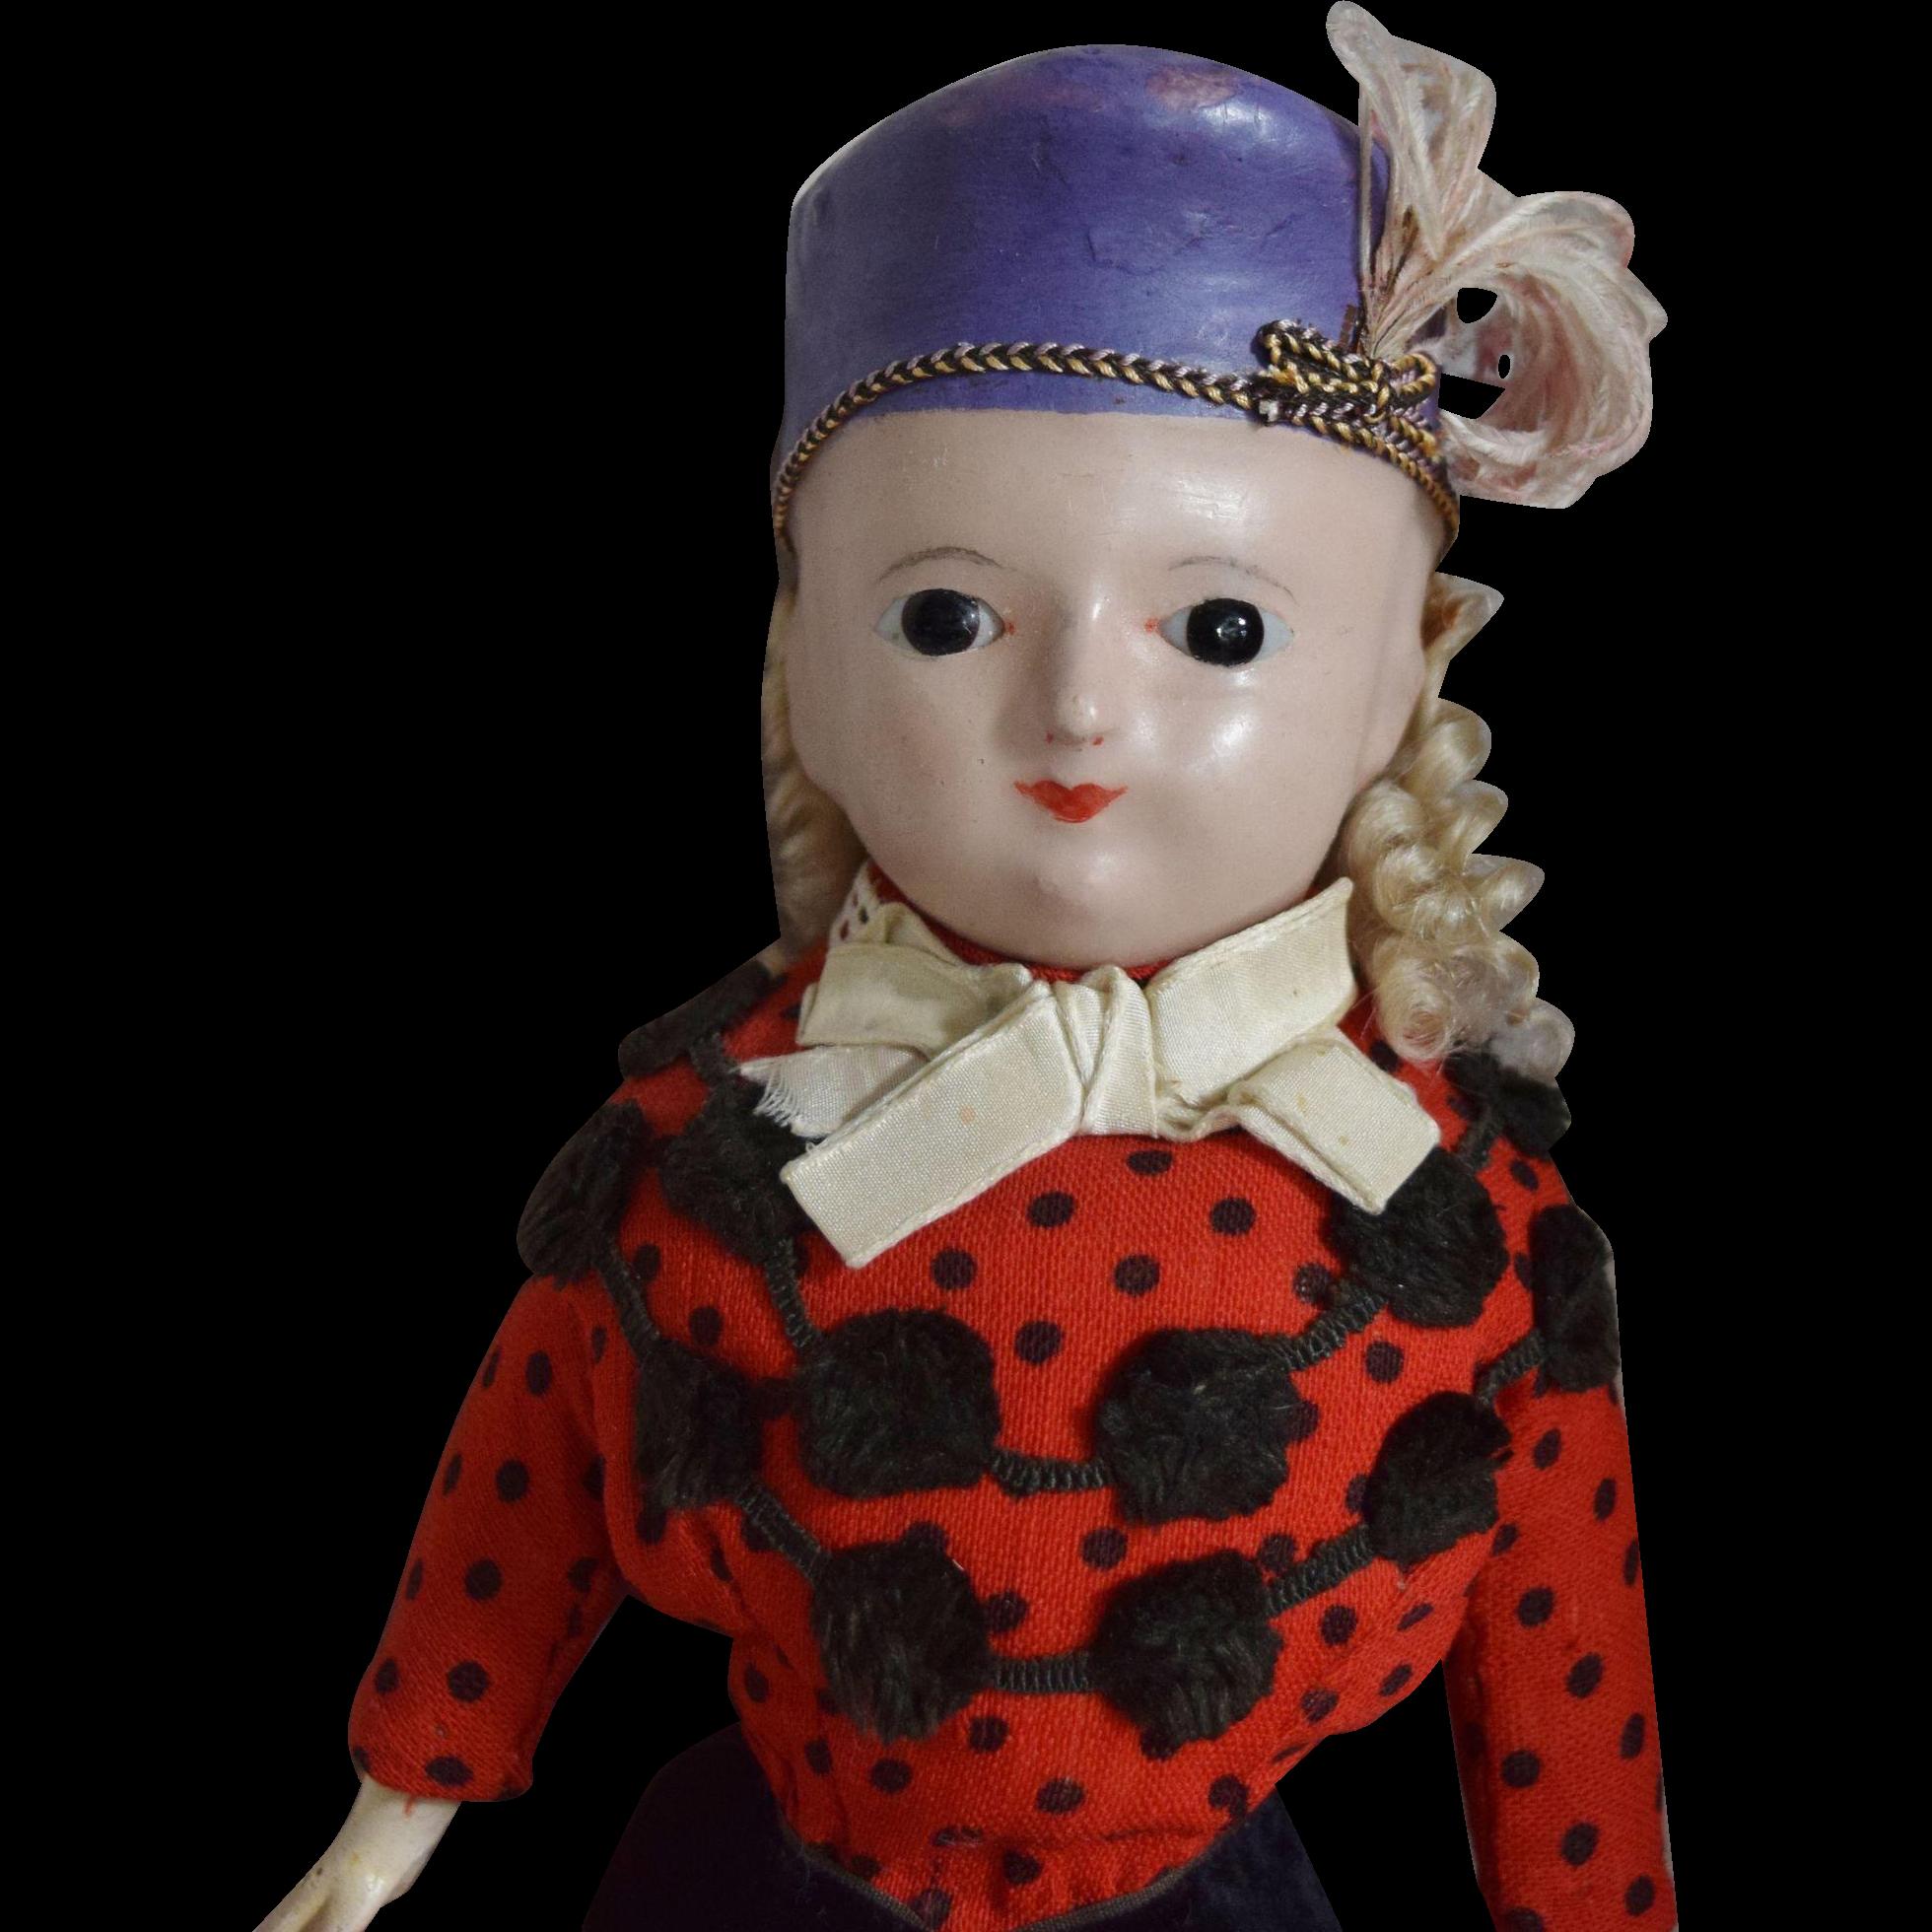 All Original German Wax Over Papier Mache Molded Hat Doll